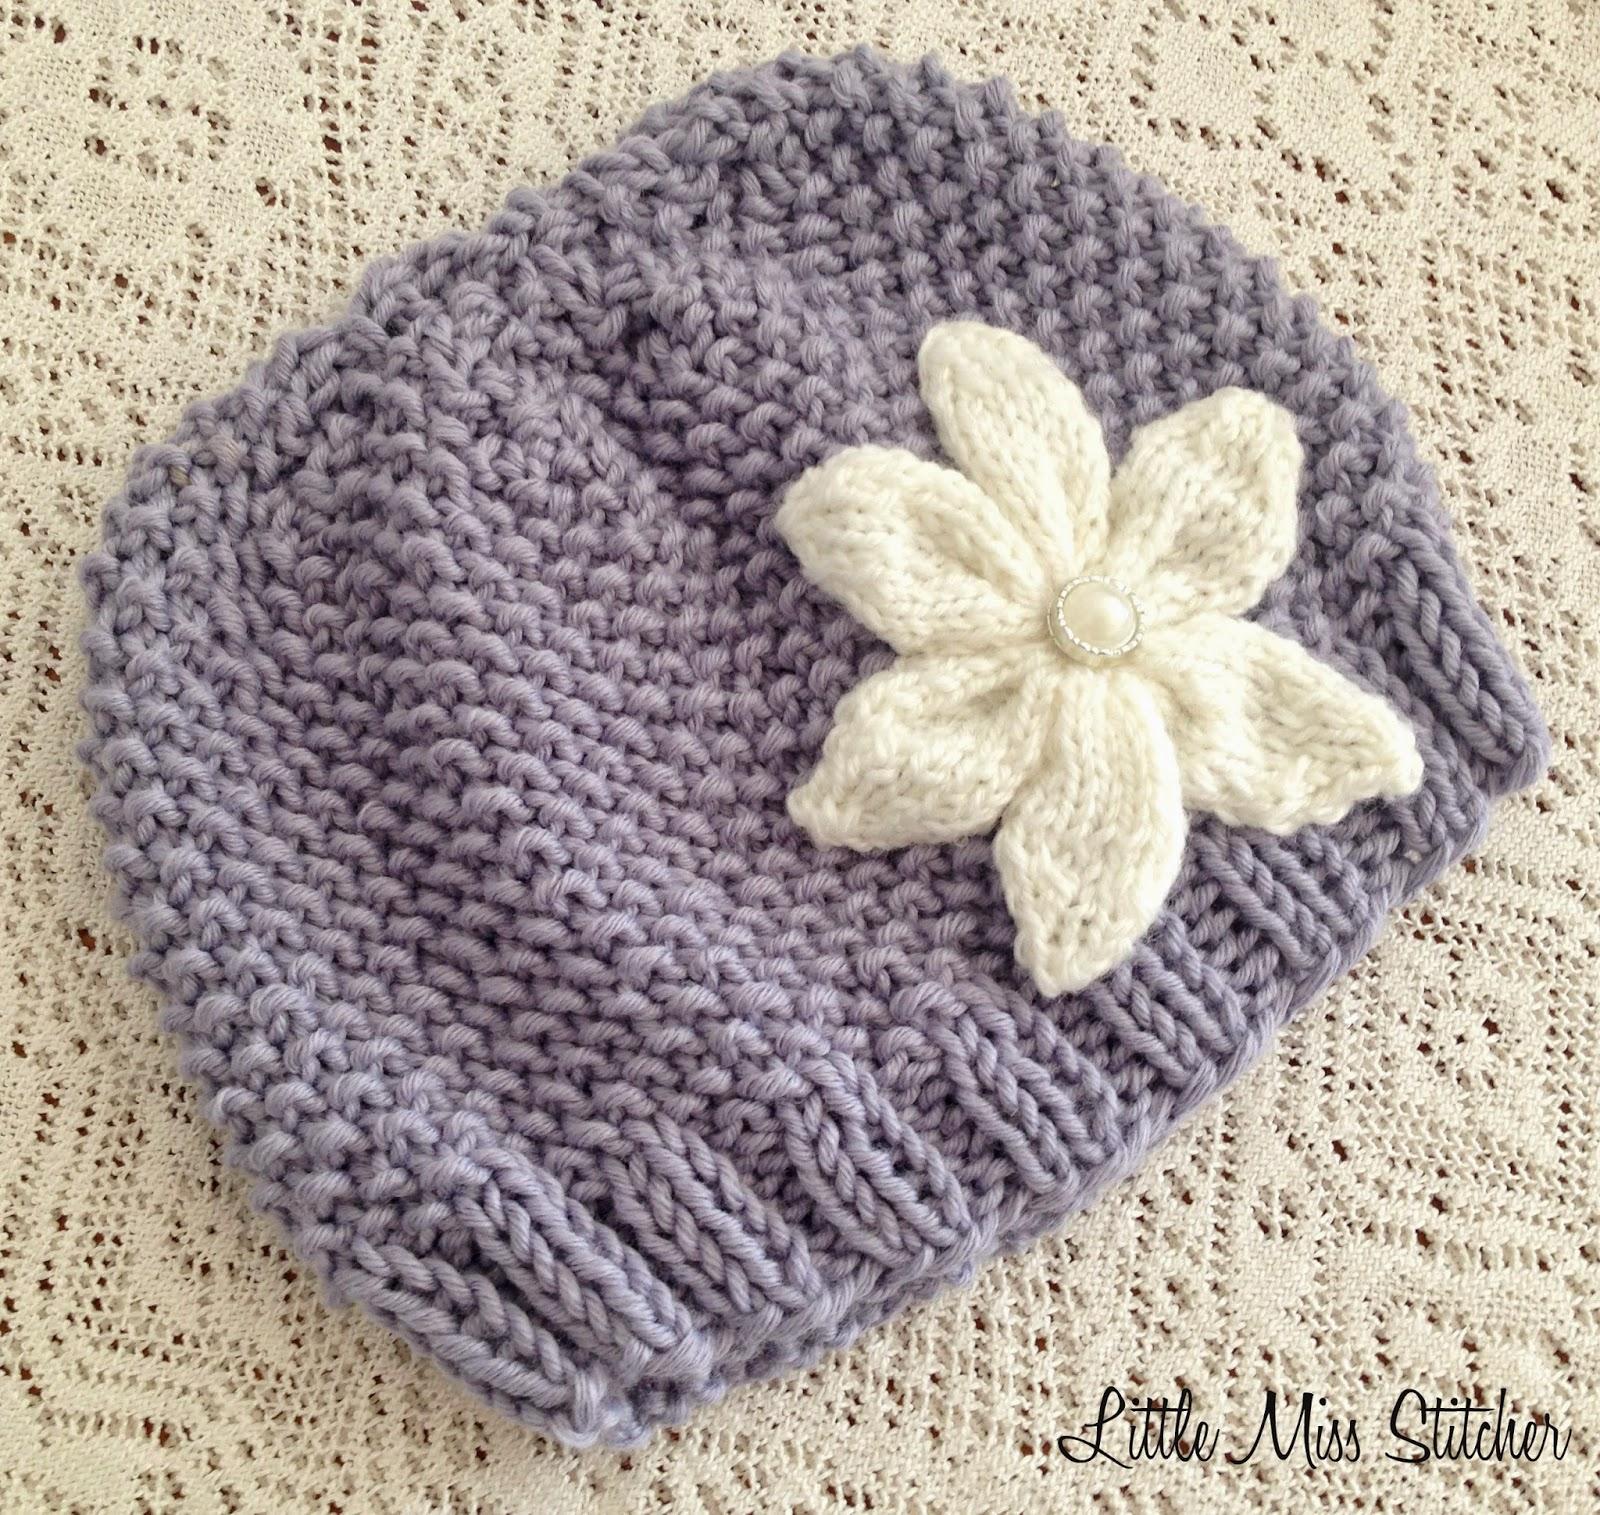 e9973fa6c22 Ravelry  Basic Baby Hat pattern by Heather Tucker